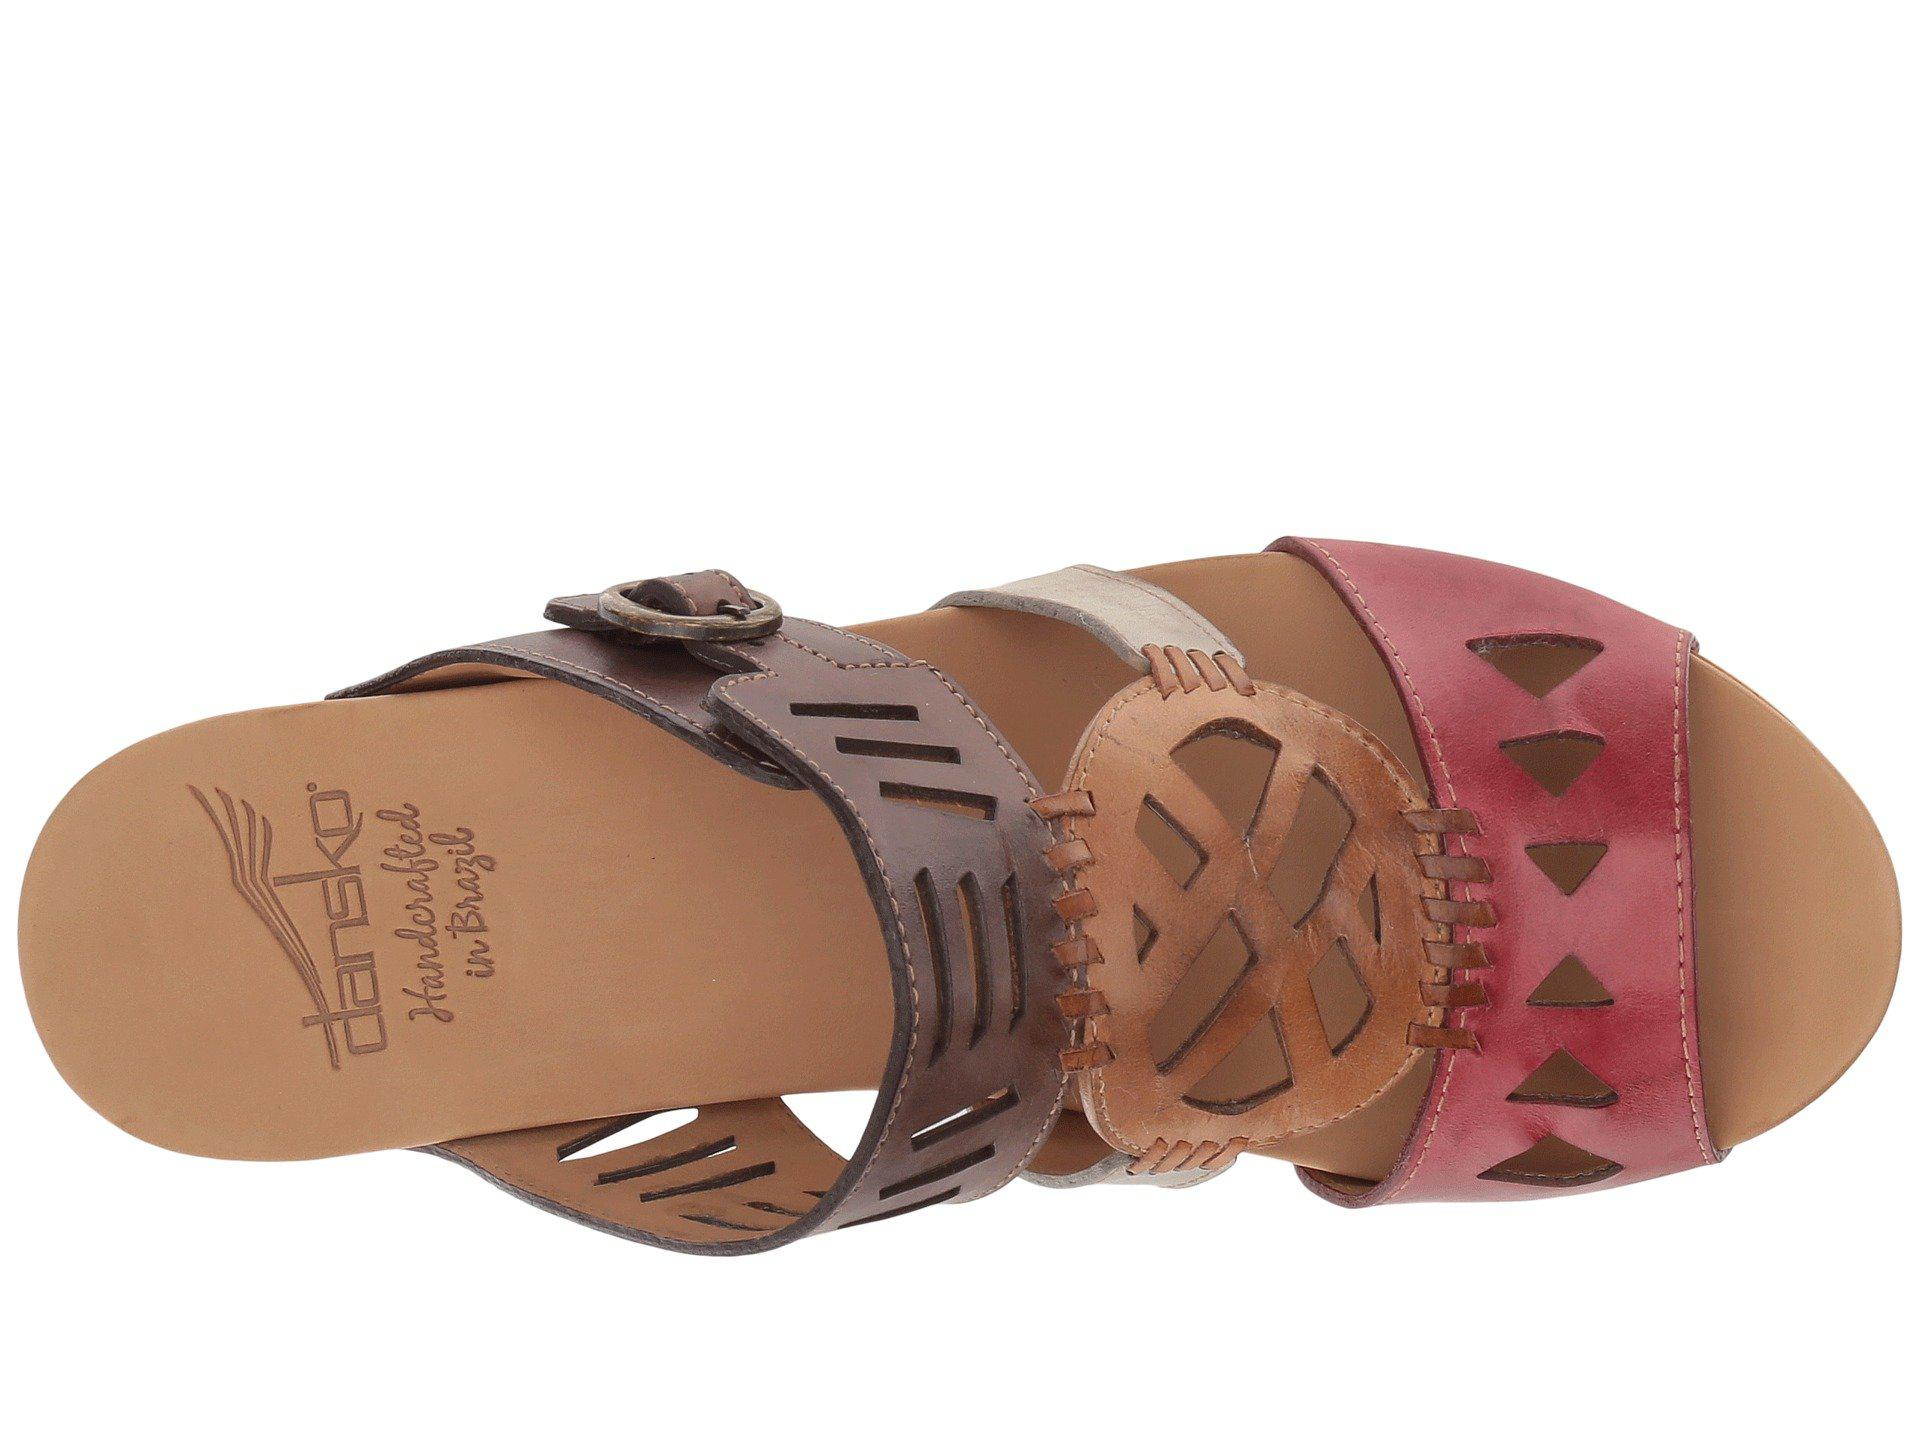 f34e421255dc Dansko - Multicolor Oralee (multi Waxy Full Grain) Women s Clog mule Shoes  -. View fullscreen